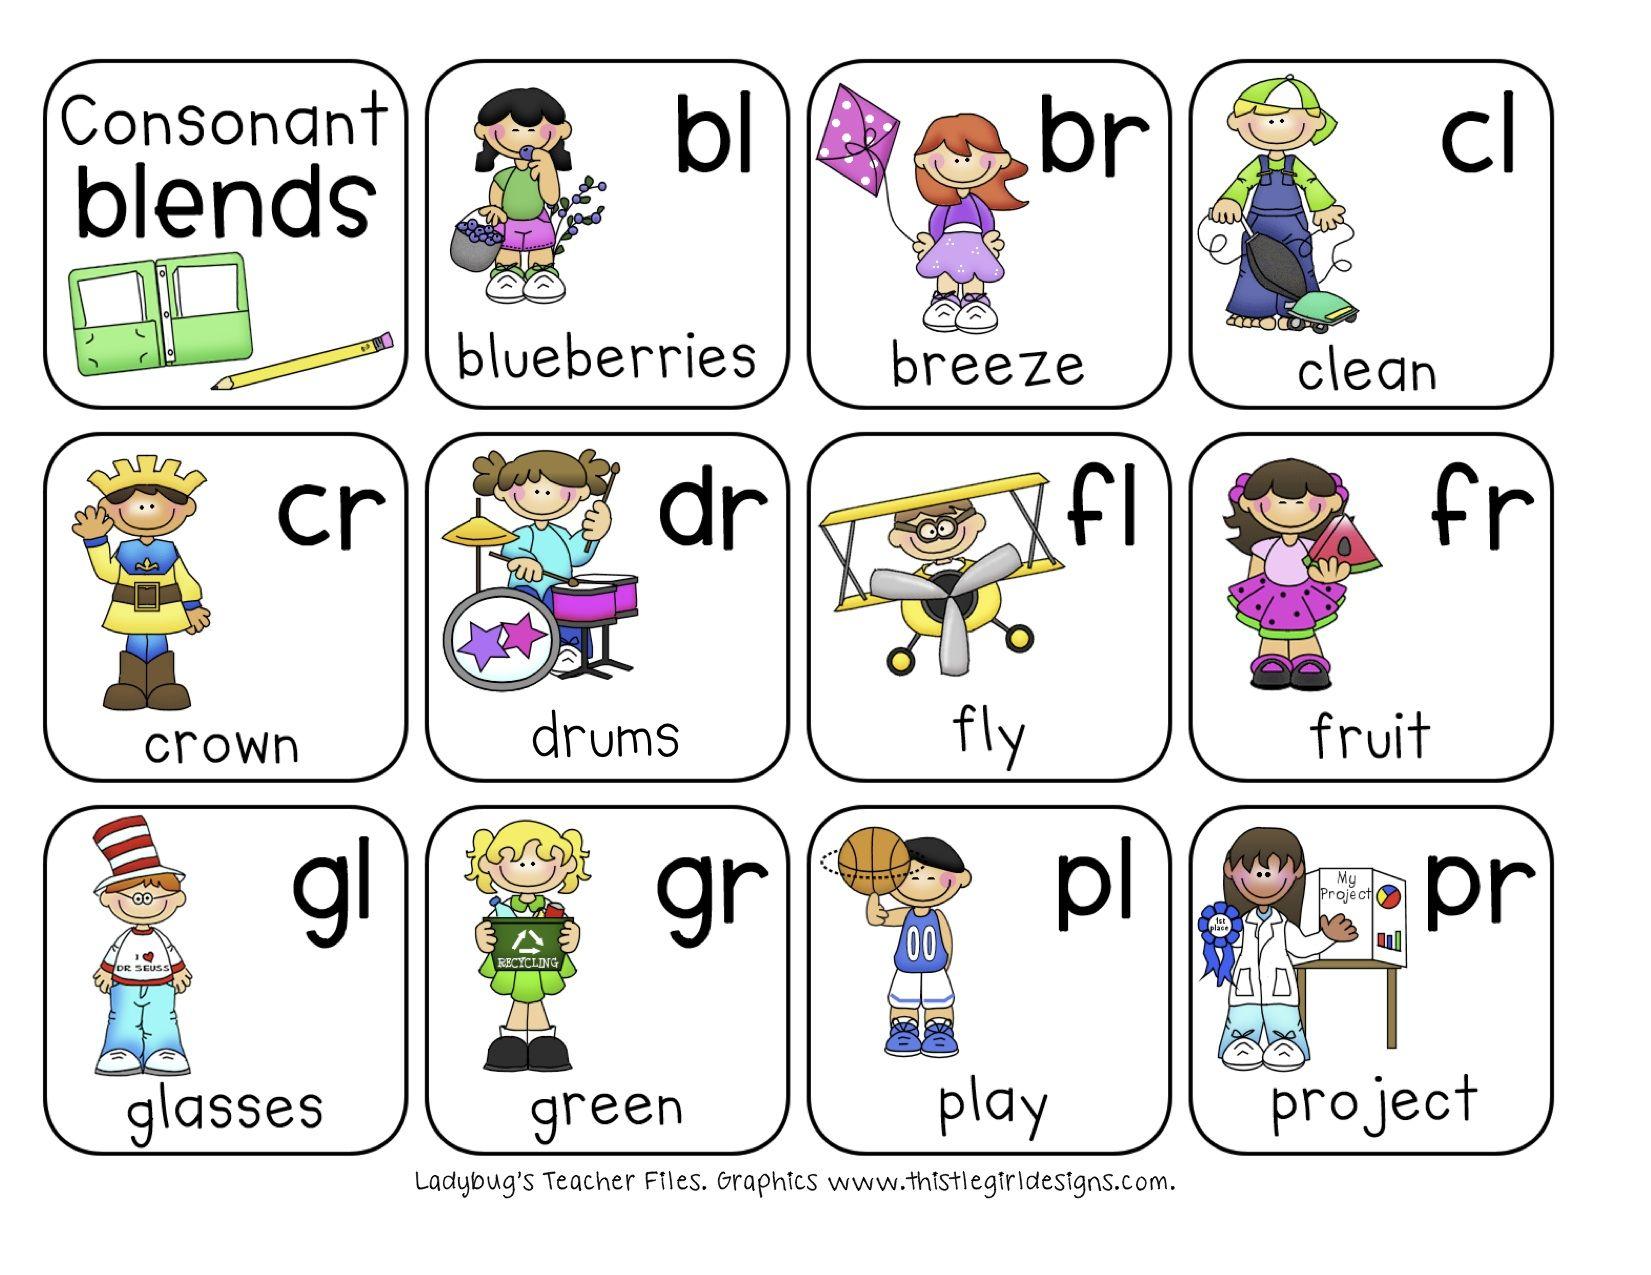 Consonant Blends Chart